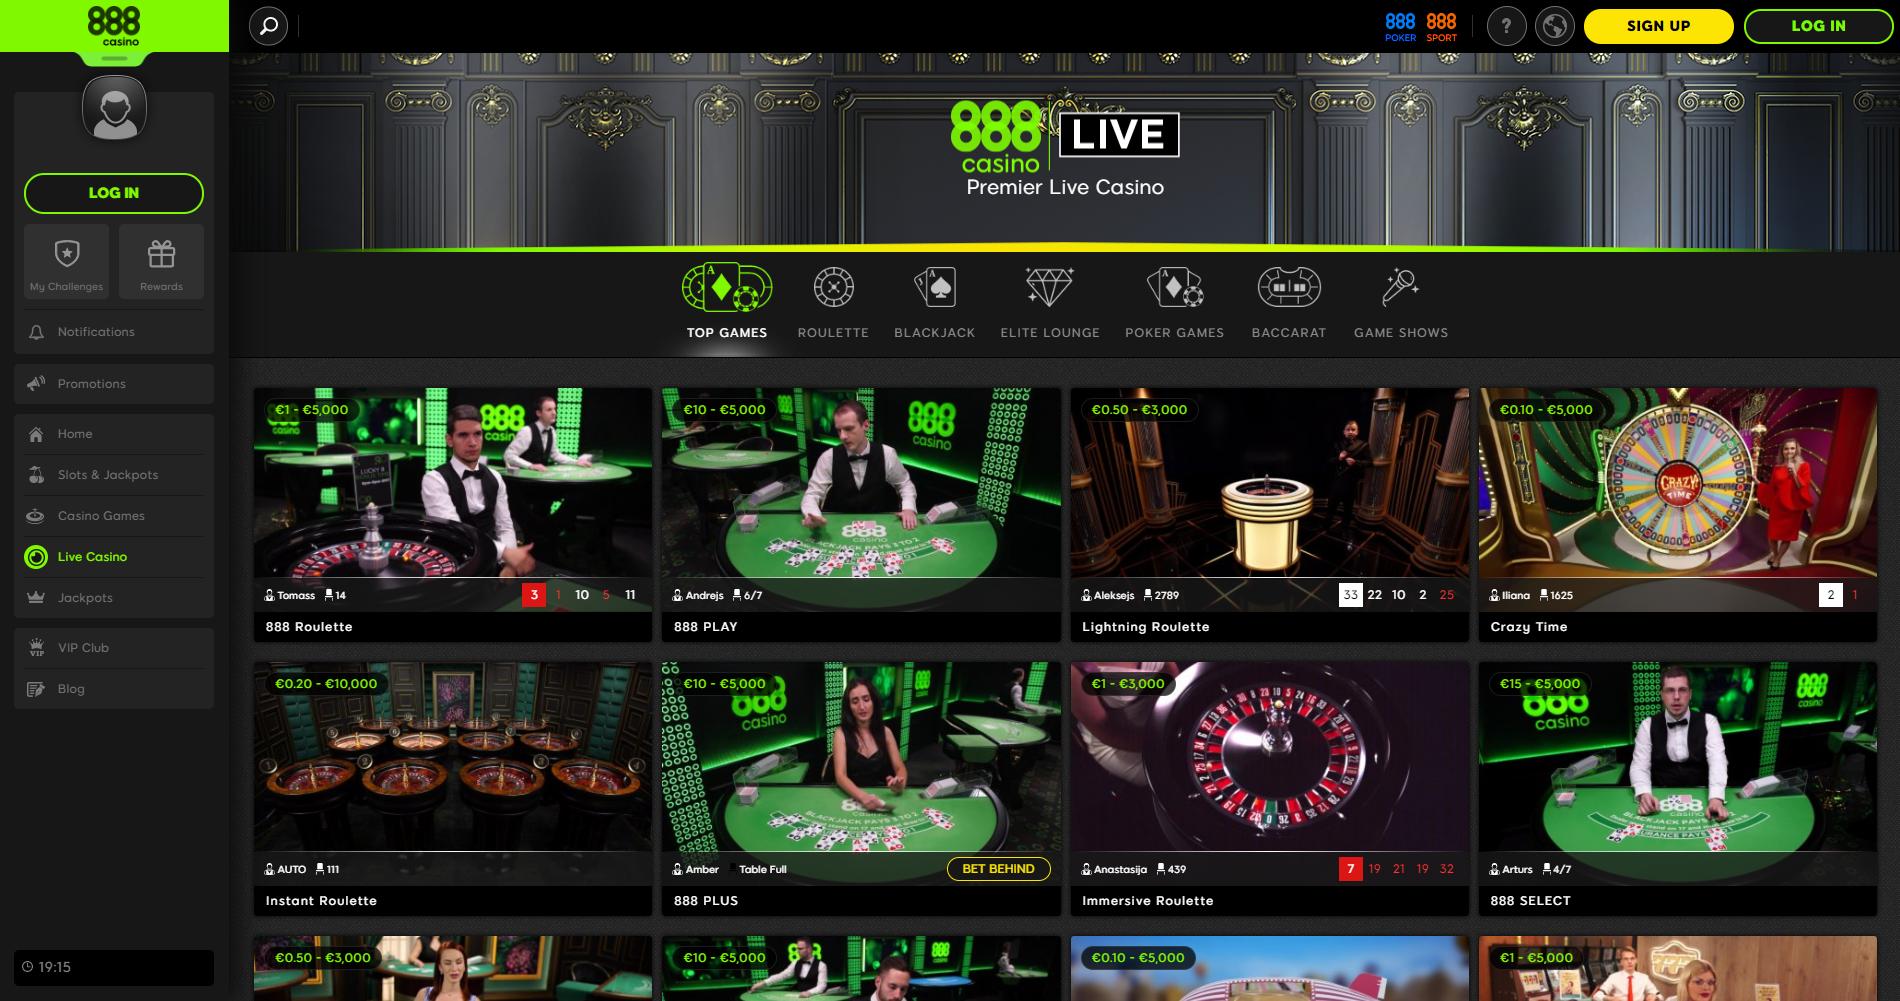 888 live casino blackjack crazy time lightning roulette instant roulette dalintojas kazino gyvai